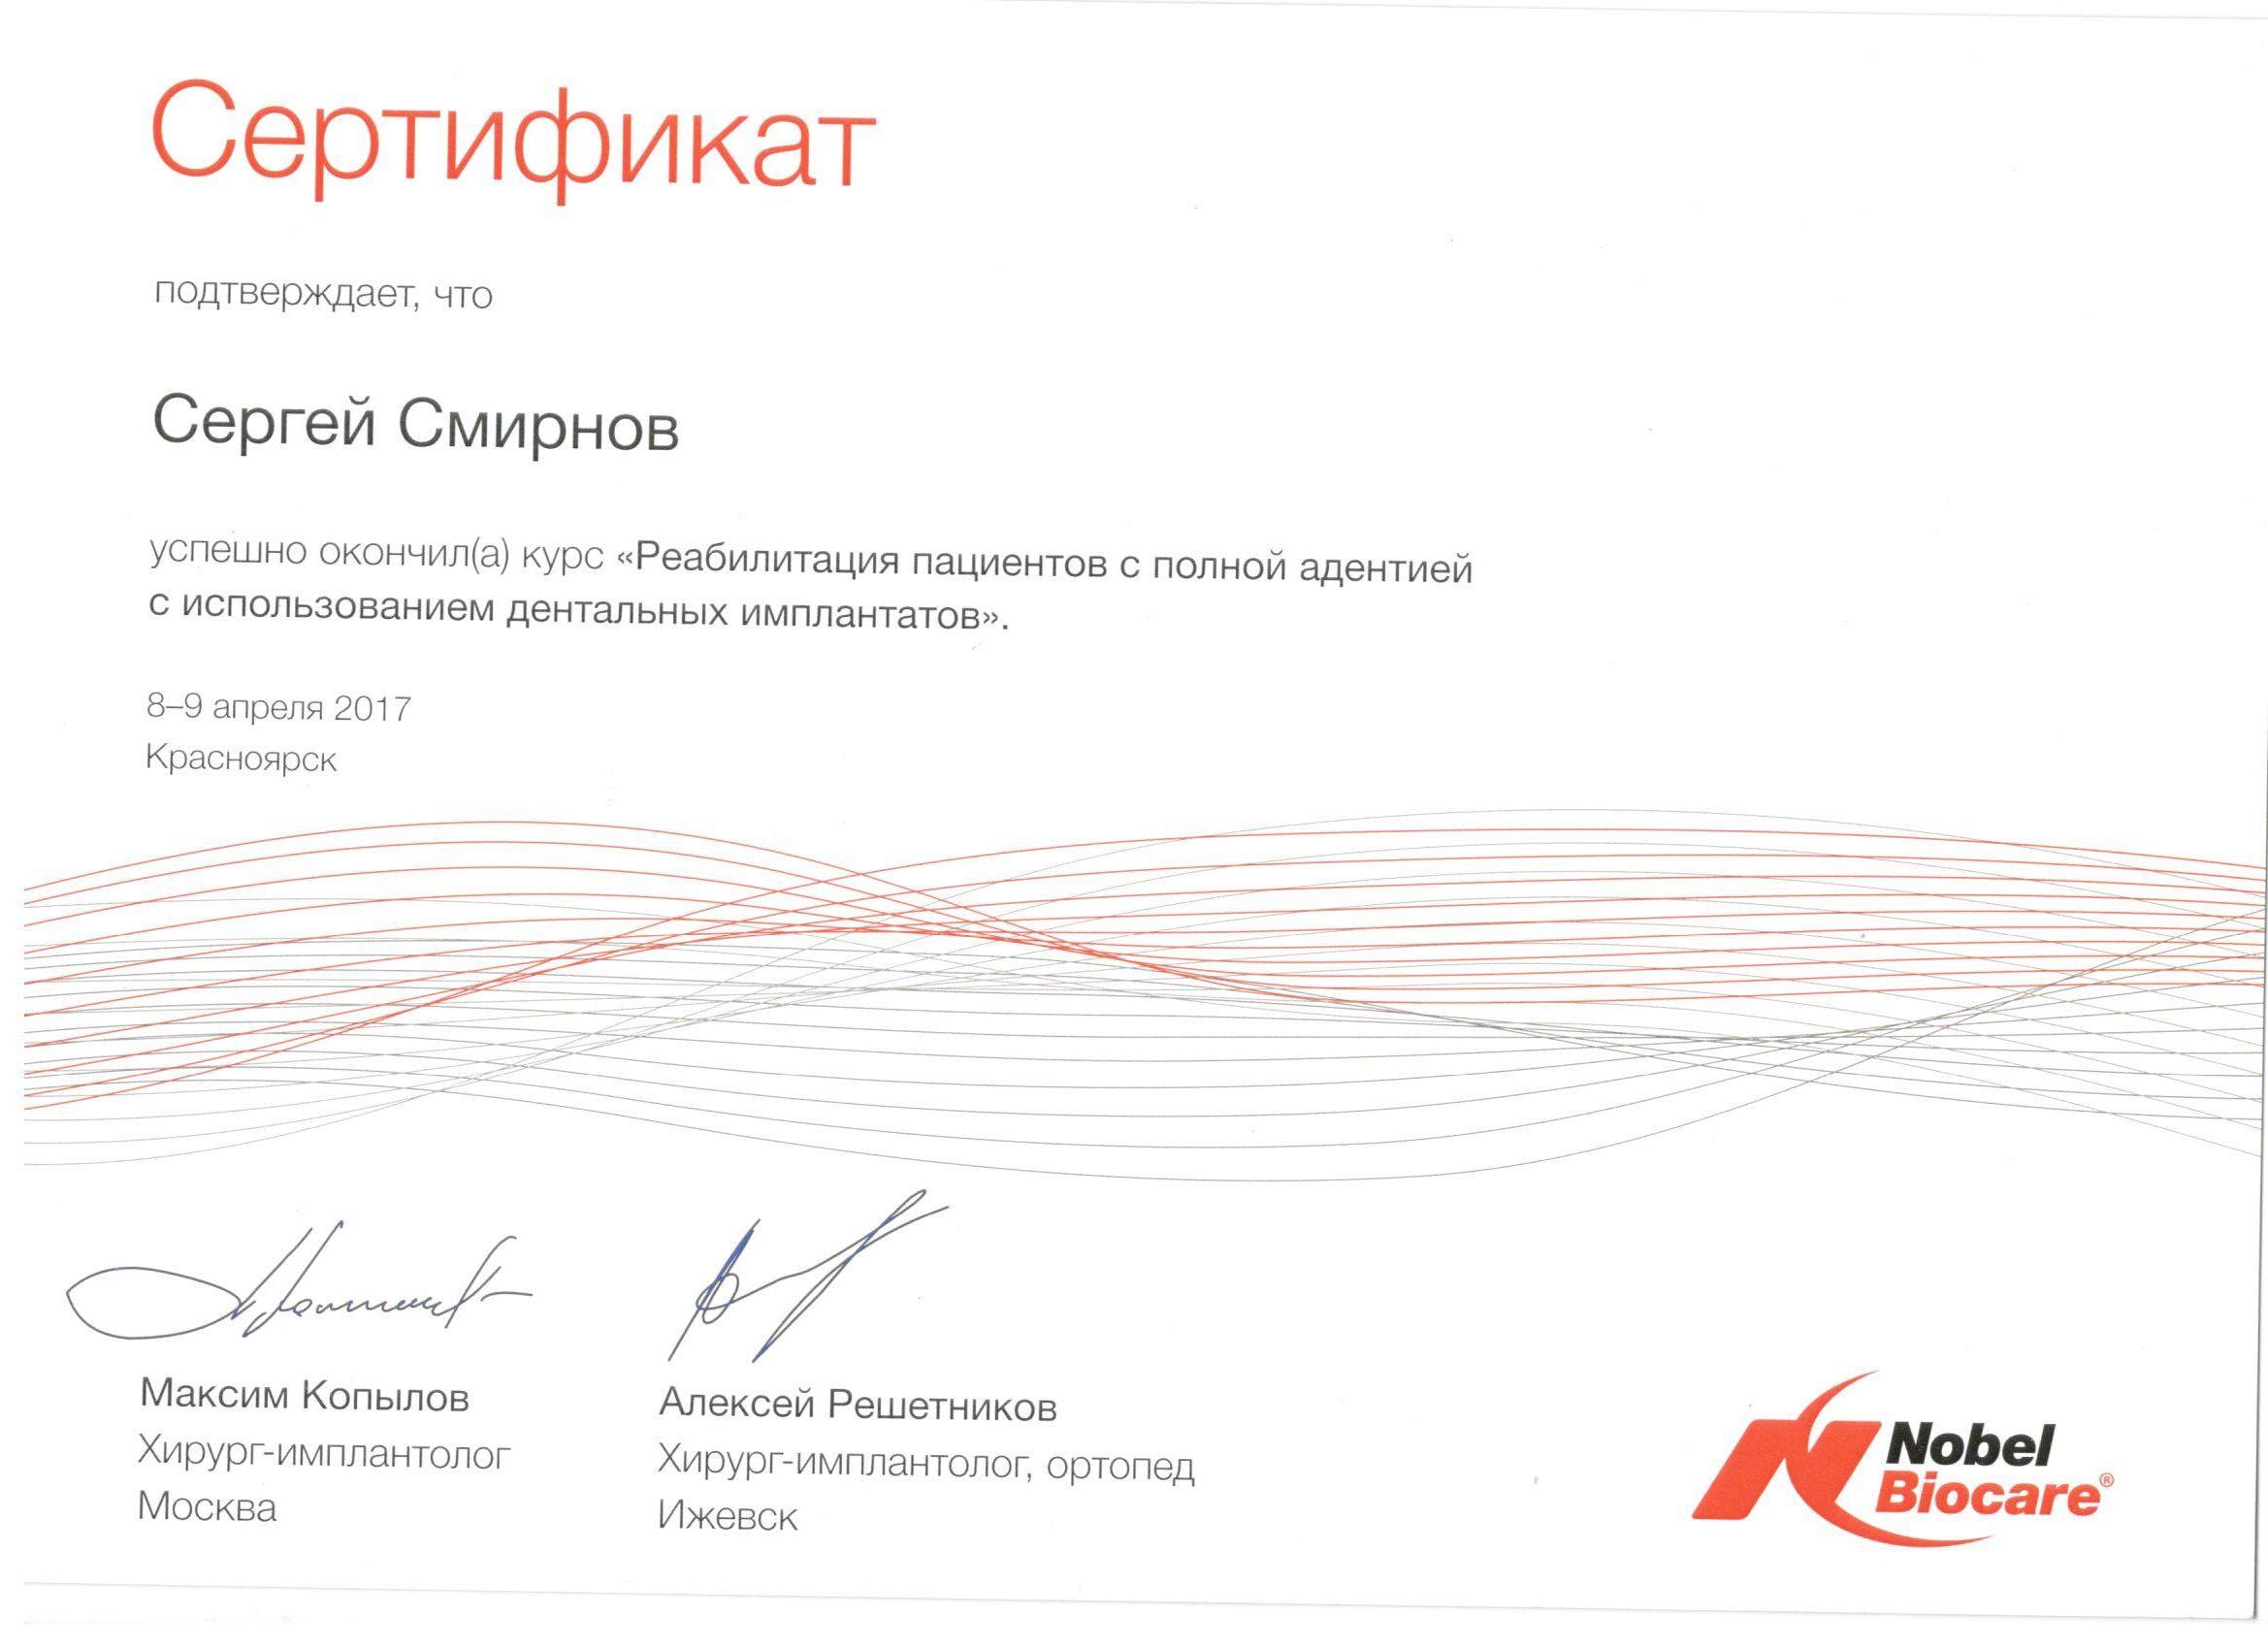 Сертификат 008